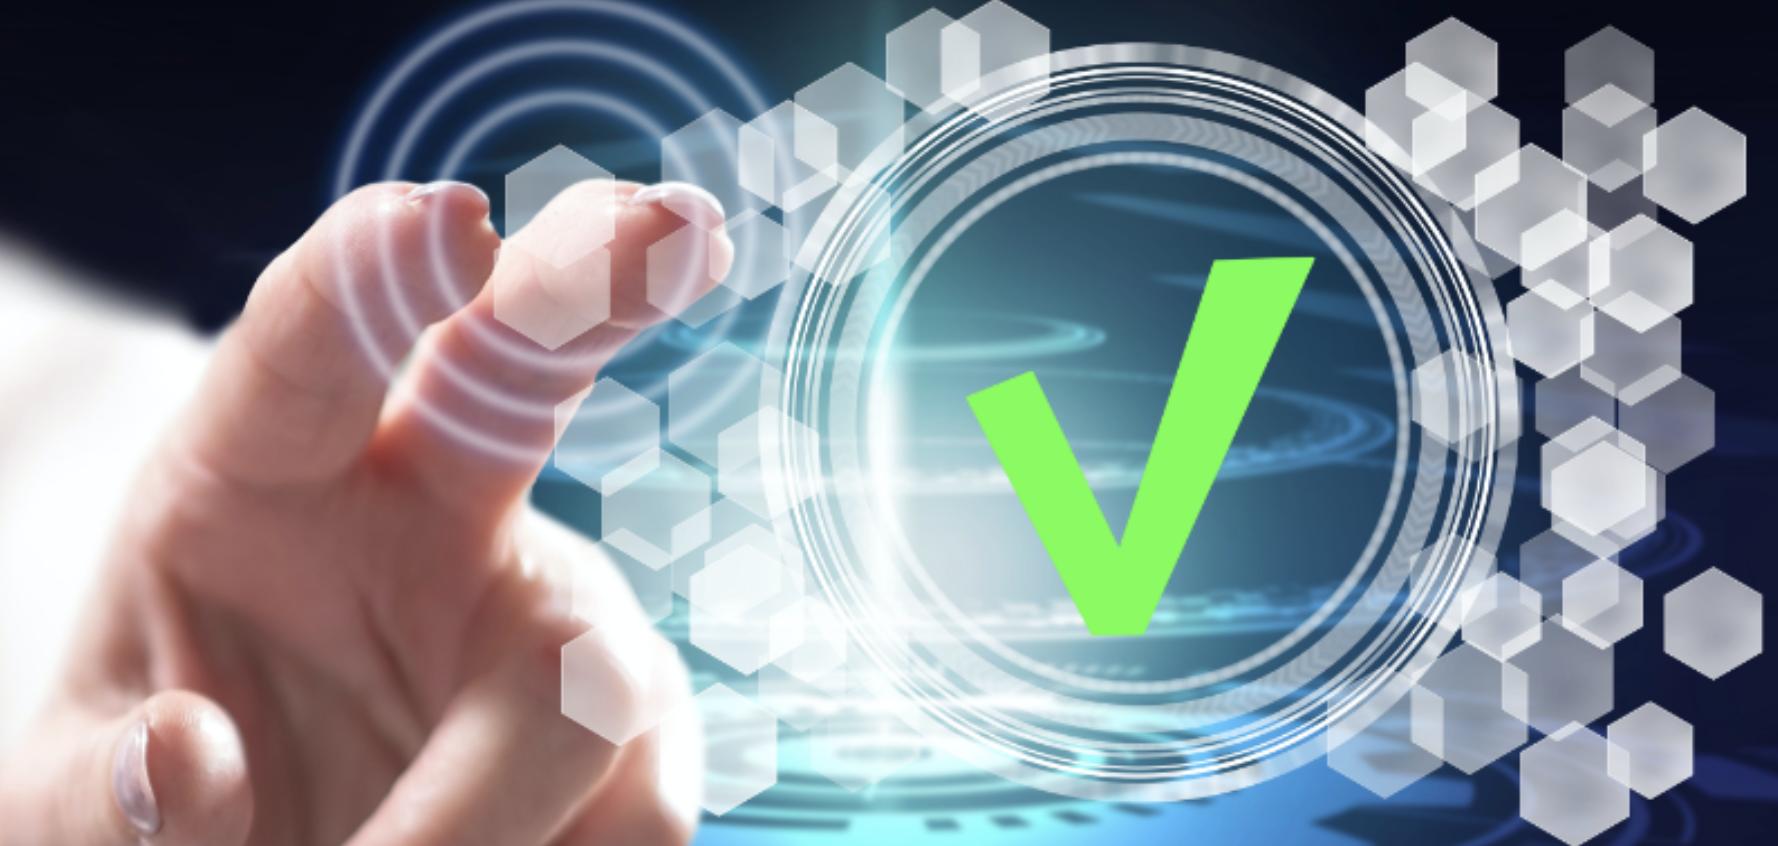 Nivelo is a NACHA preferred Third-Party Validation Service Vendor